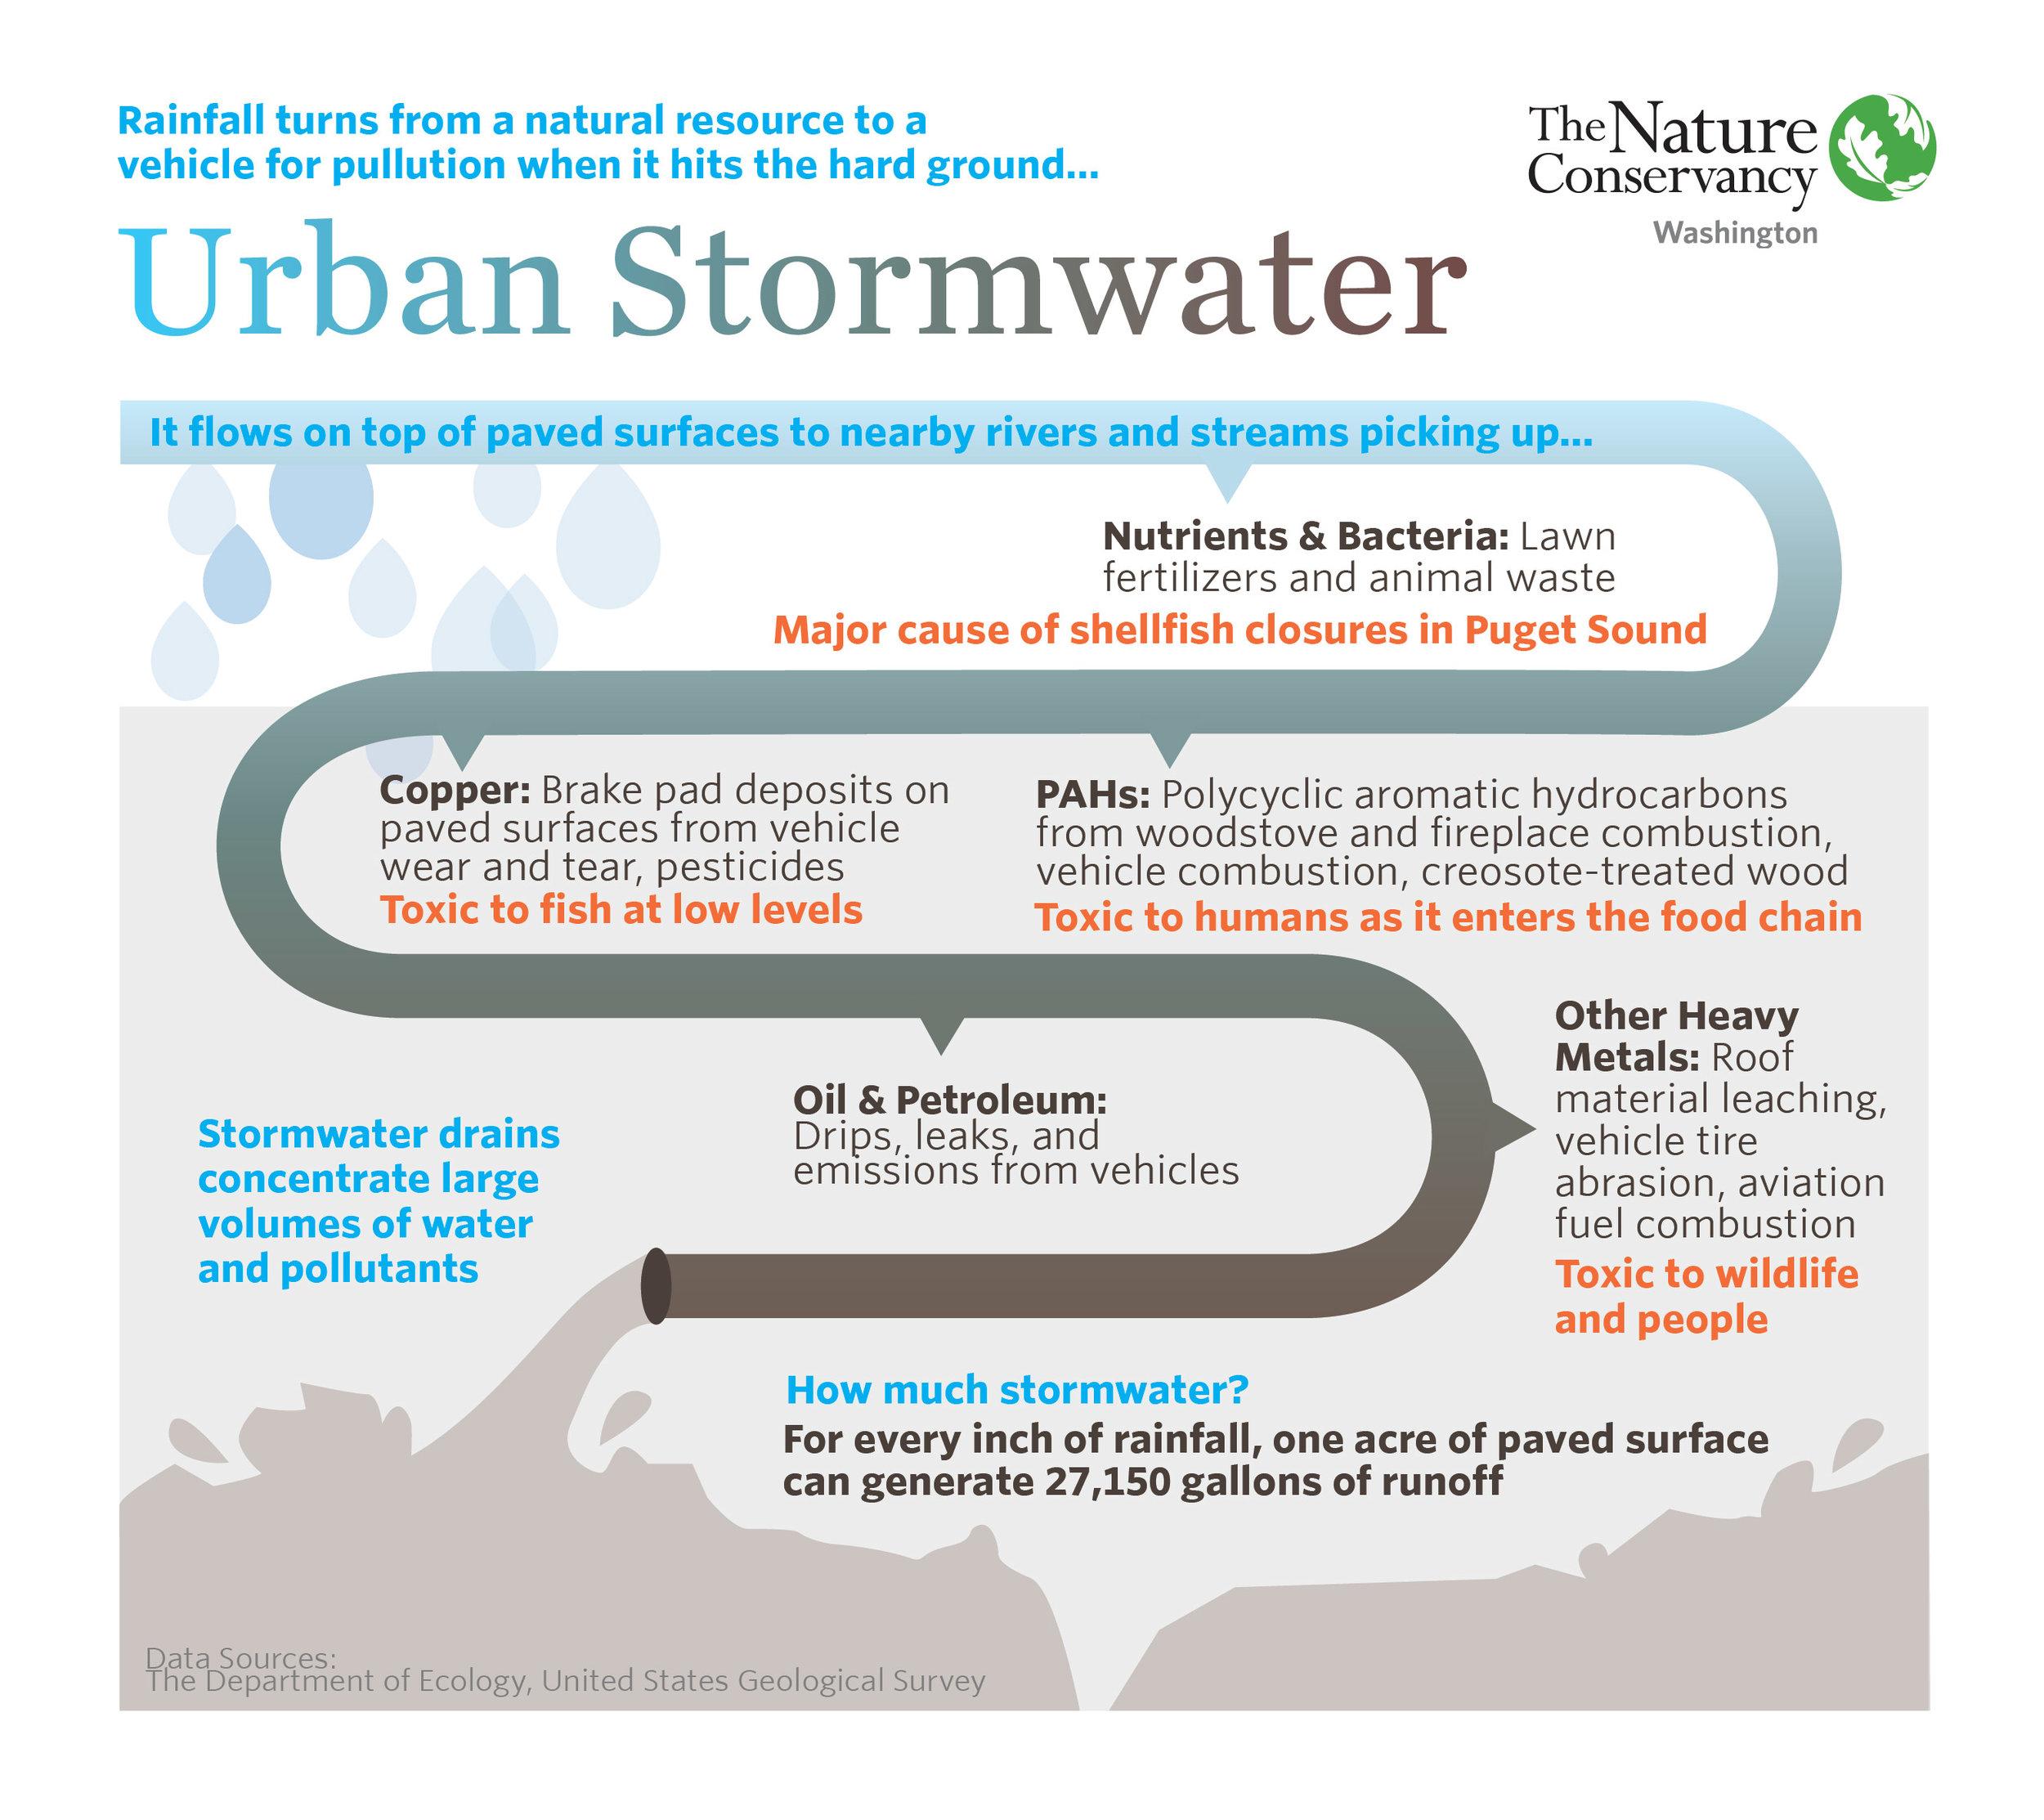 UrbanStormwater_20180507 (1).jpg